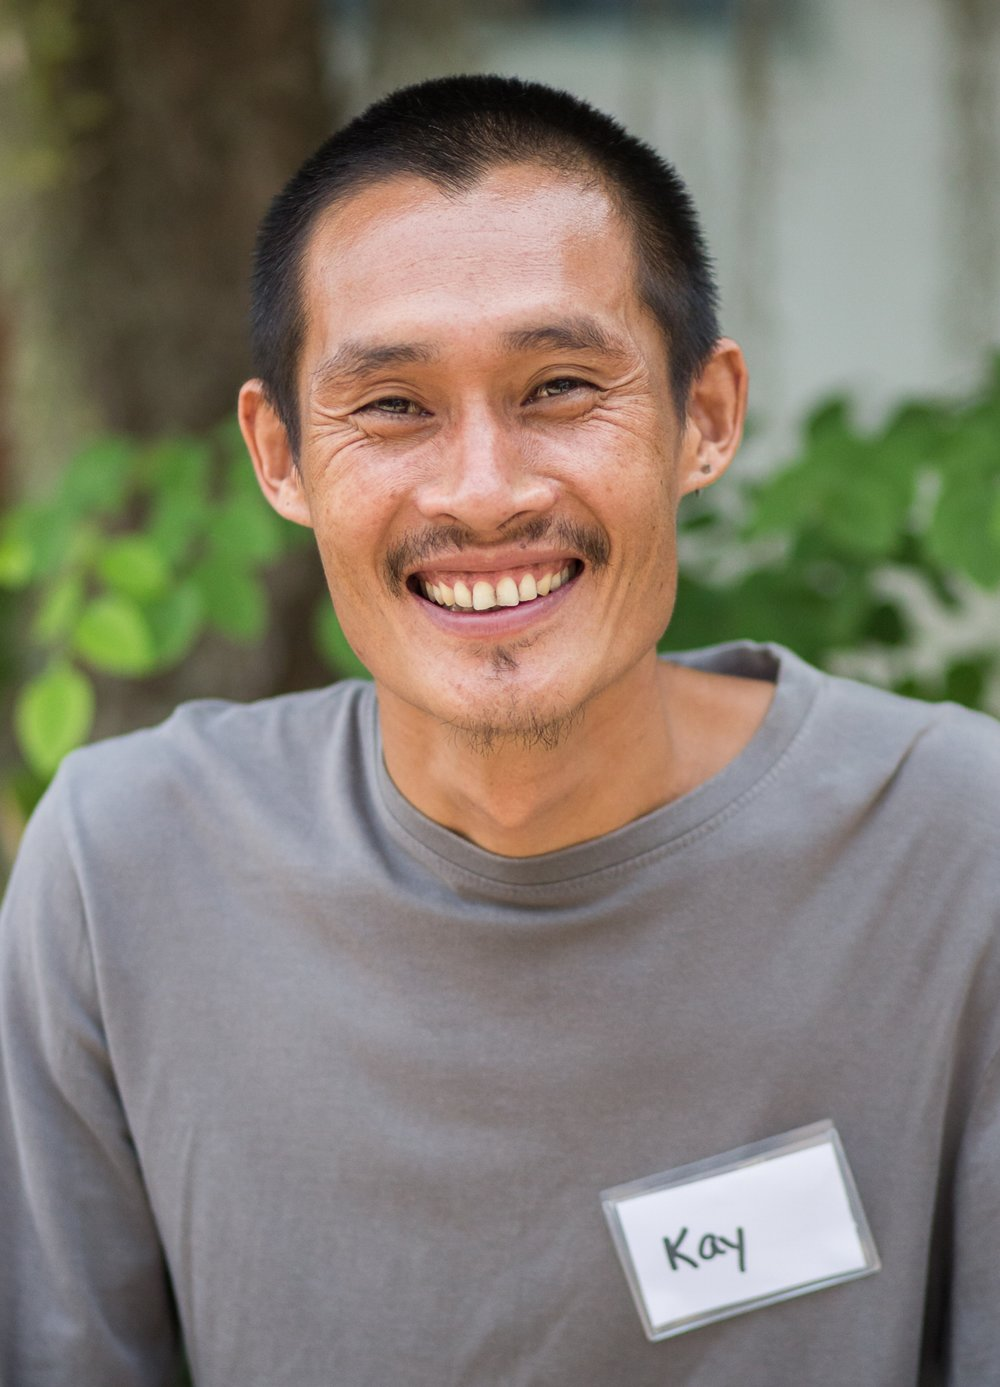 kay-thailand